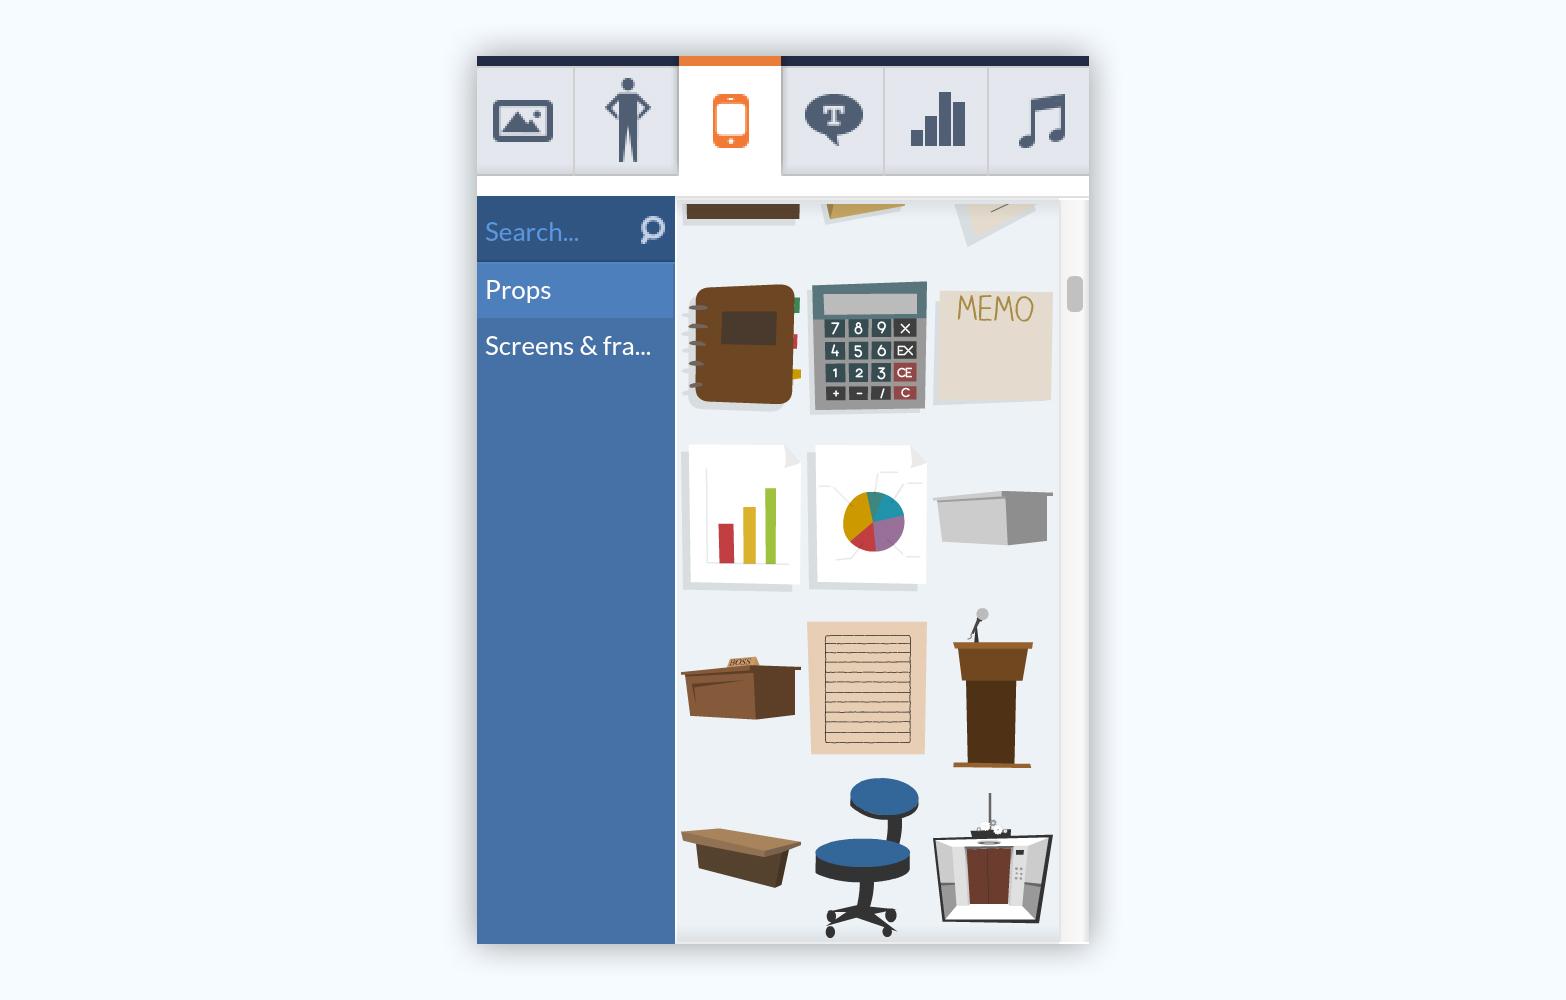 Goanimate presentation software presentation tool graphic assets